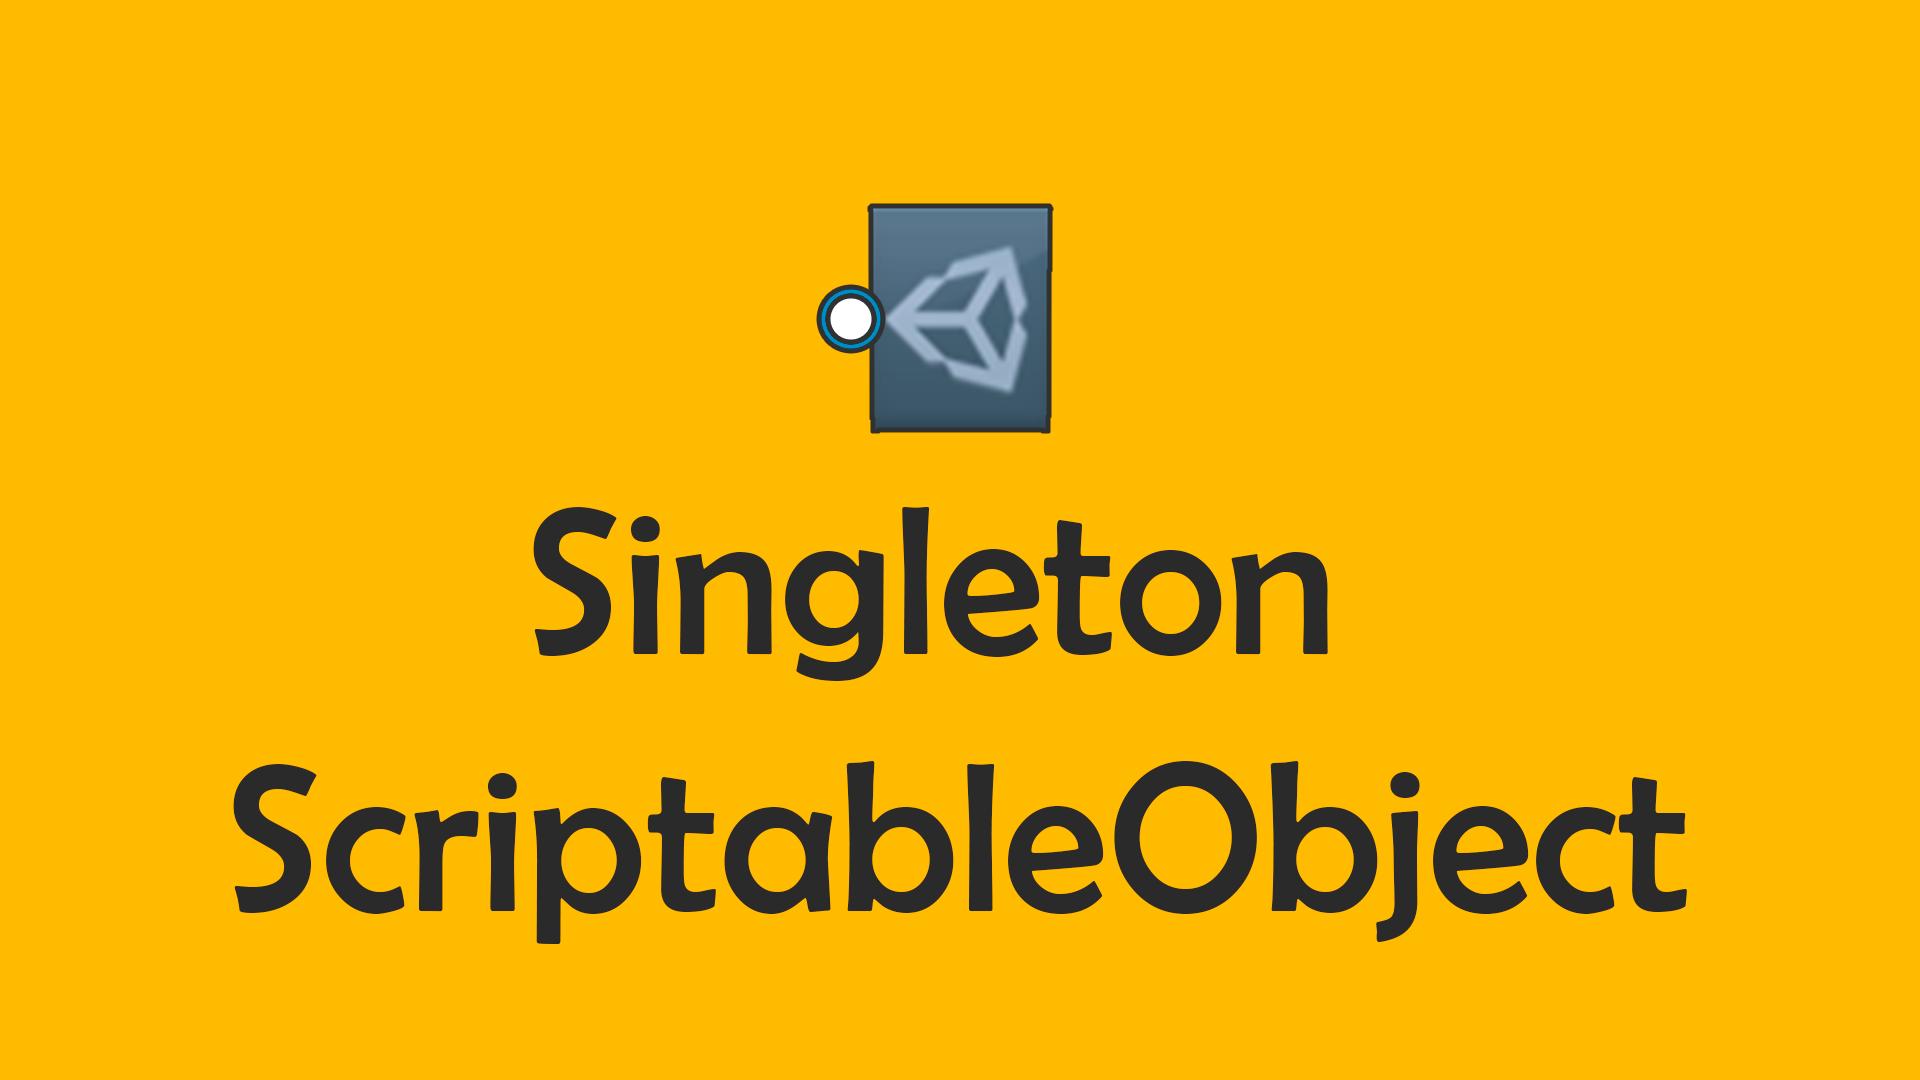 Singleton ScriptableObject